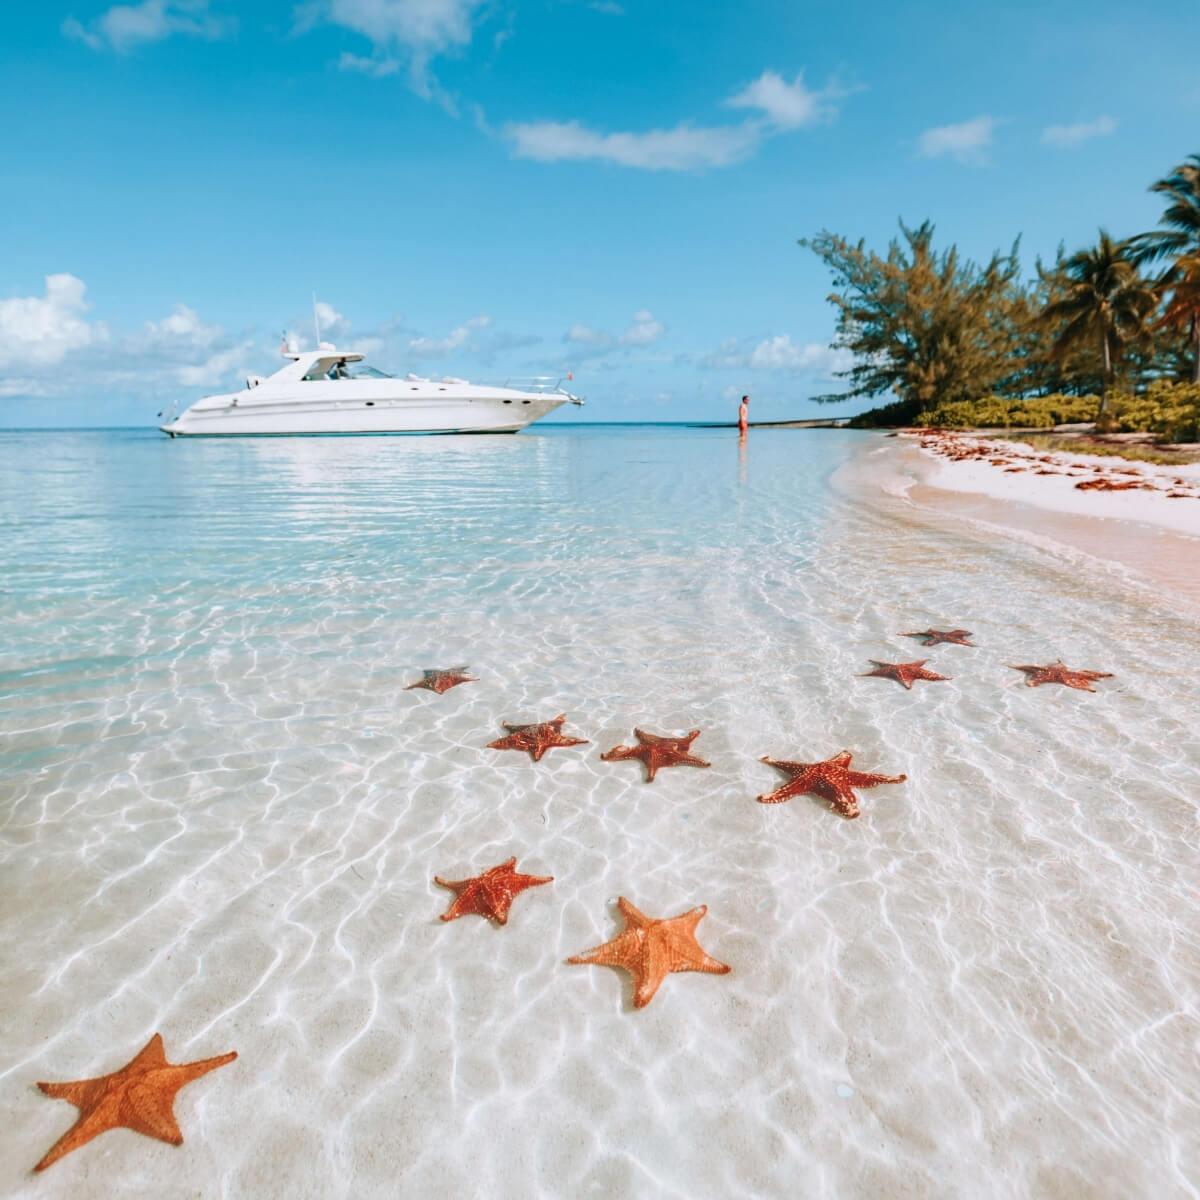 Cayman Islands Tourism Association - Global Concierge Citizen Program - Charter Boat to Starfish Point - Seascape Villa